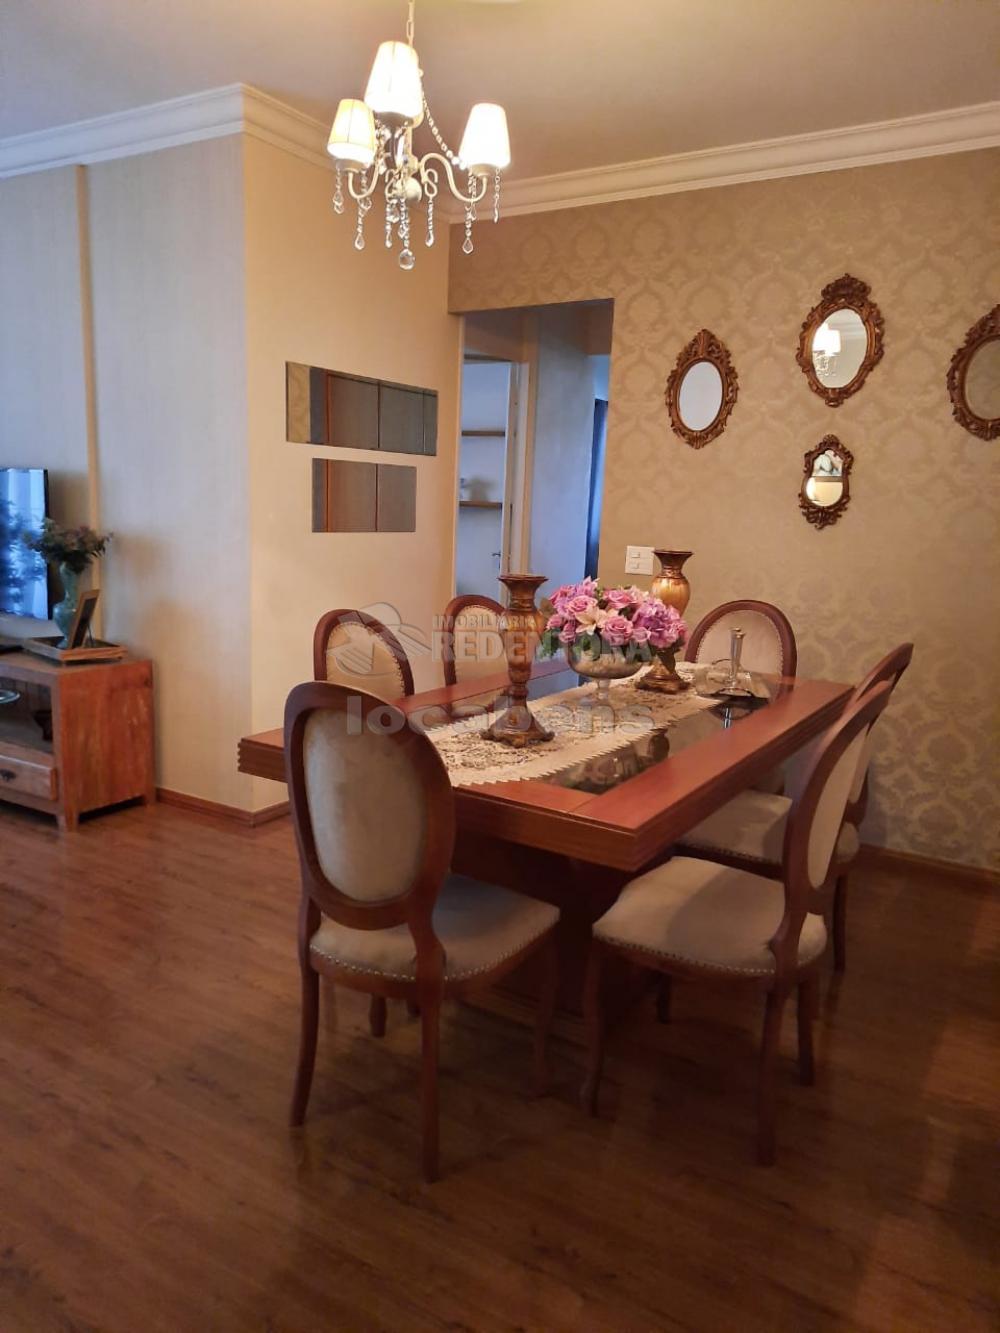 Sao Jose do Rio Preto Apartamento Venda R$480.000,00 Condominio R$560,00 3 Dormitorios 2 Vagas Area construida 137.00m2